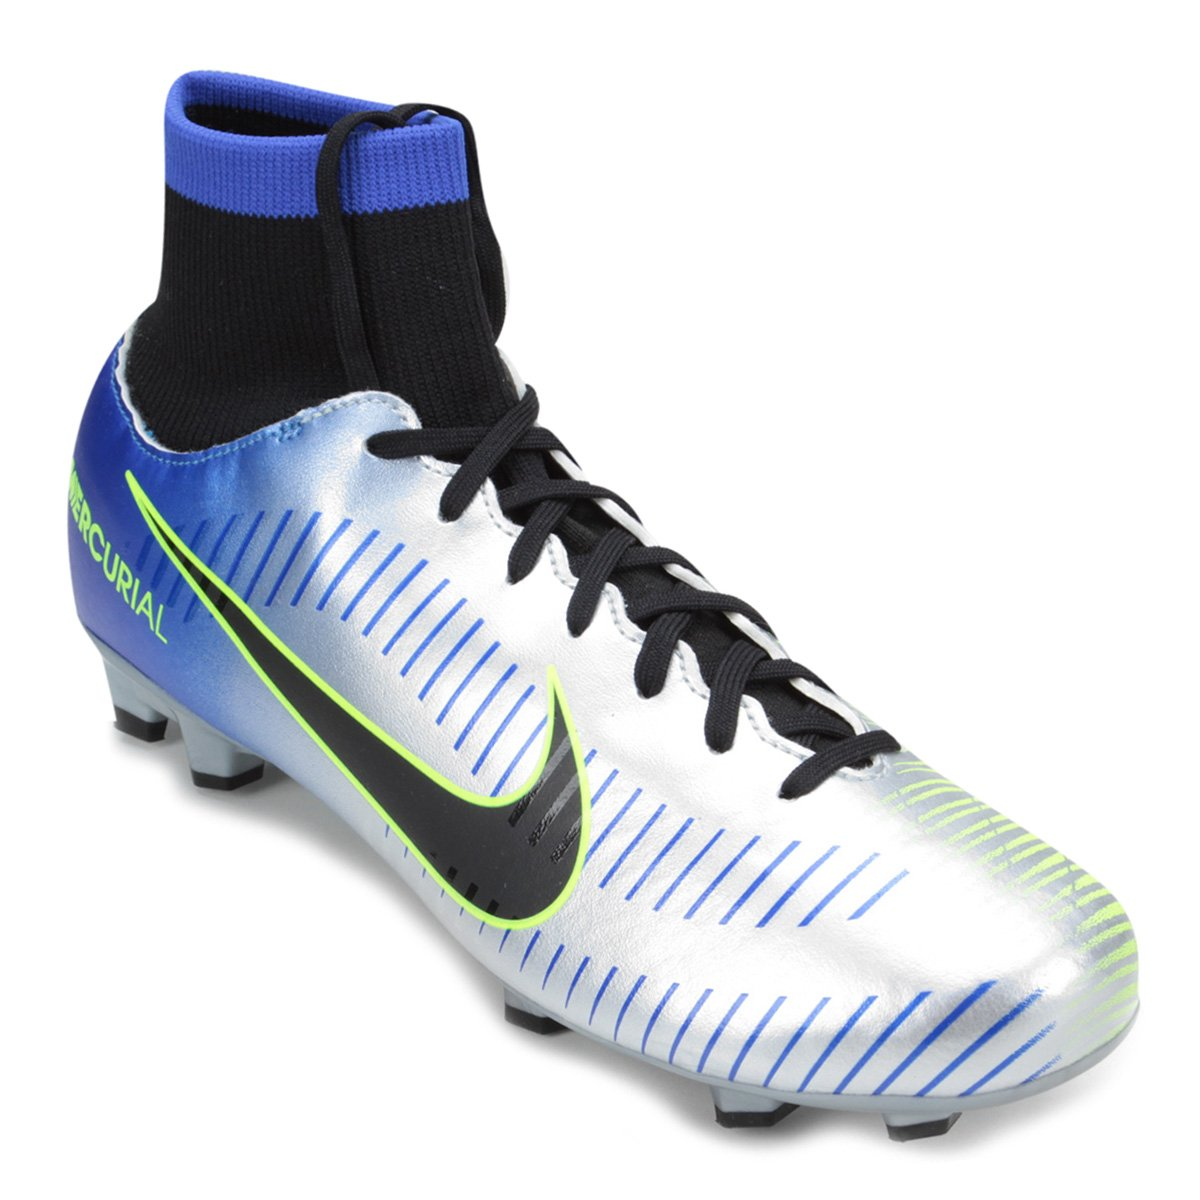 Chuteira Campo Nike Mercurial Victory 6 DF Neymar Jr FG - Azul e ... 495774dd6d161